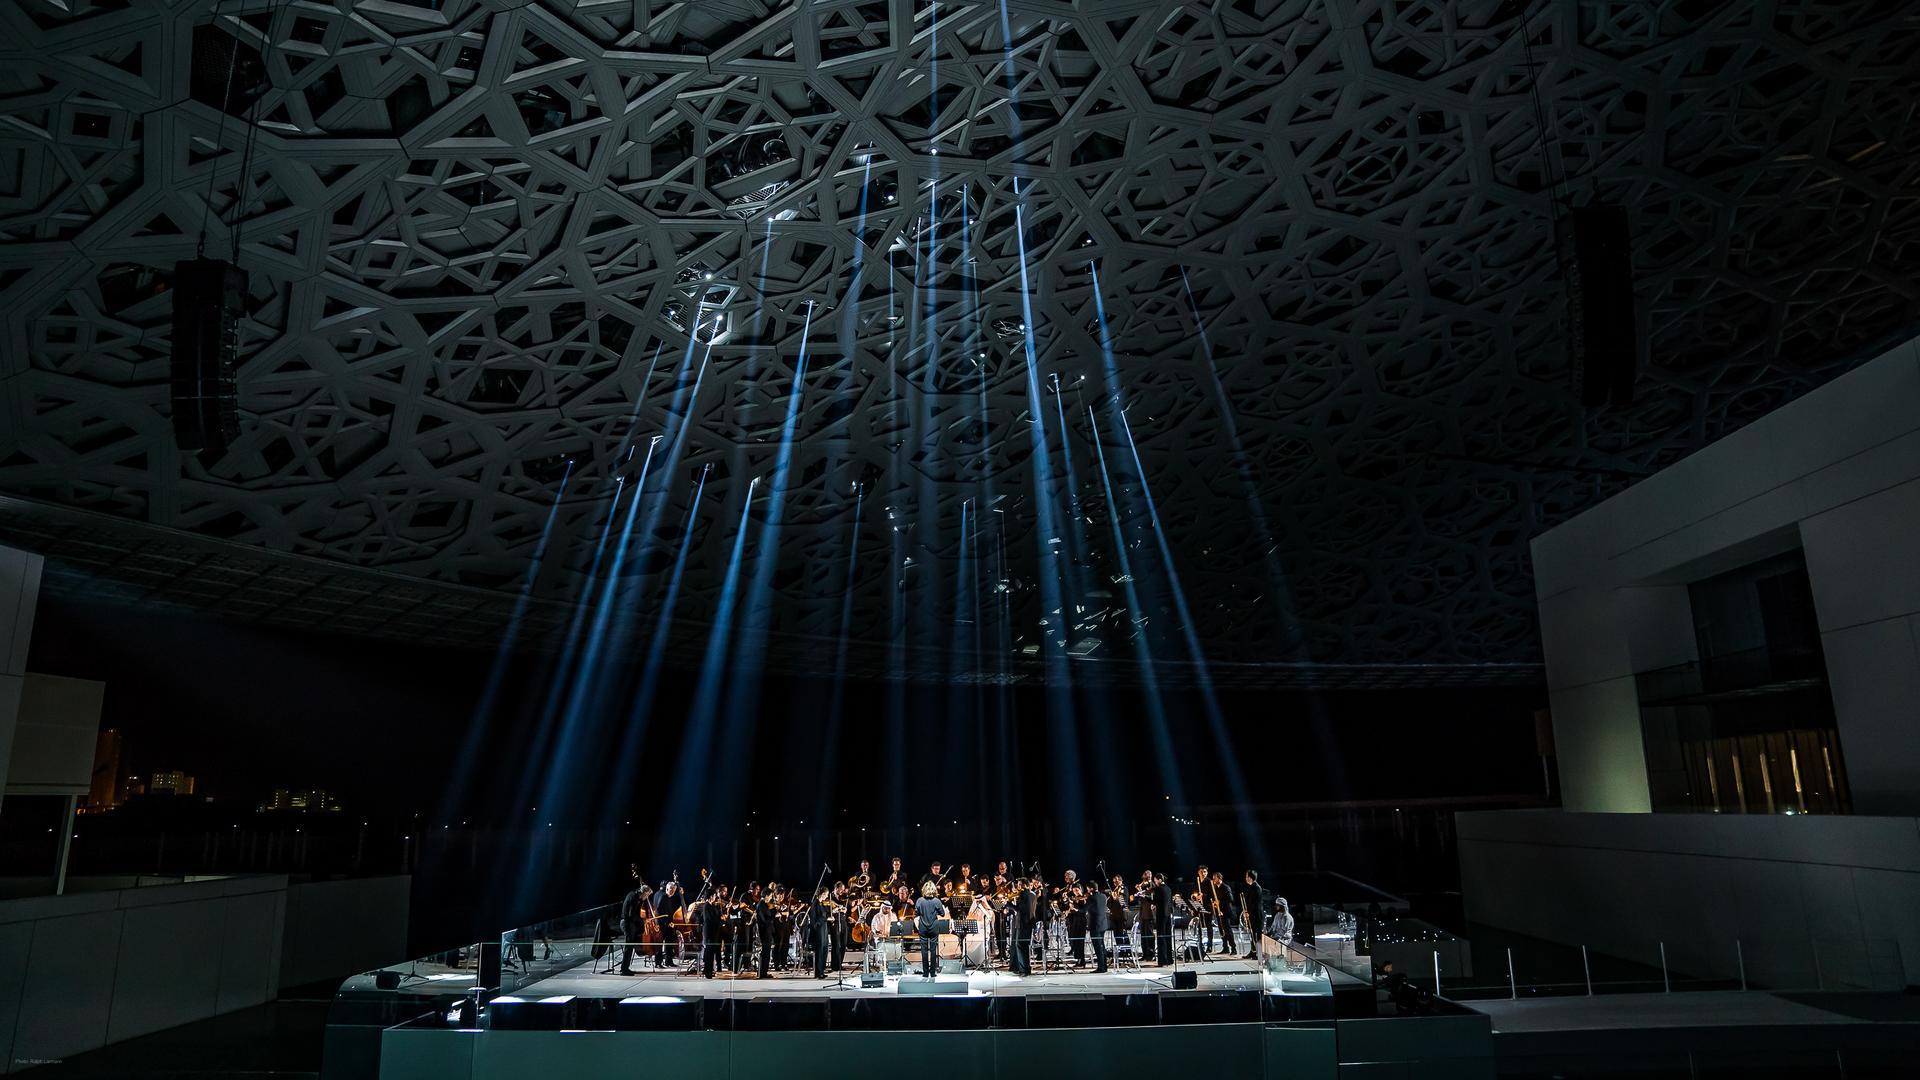 Neumann&Müller Event Technology LLC - The Louvre Abu Dhabi Opening - Photo by Ralph Larmann